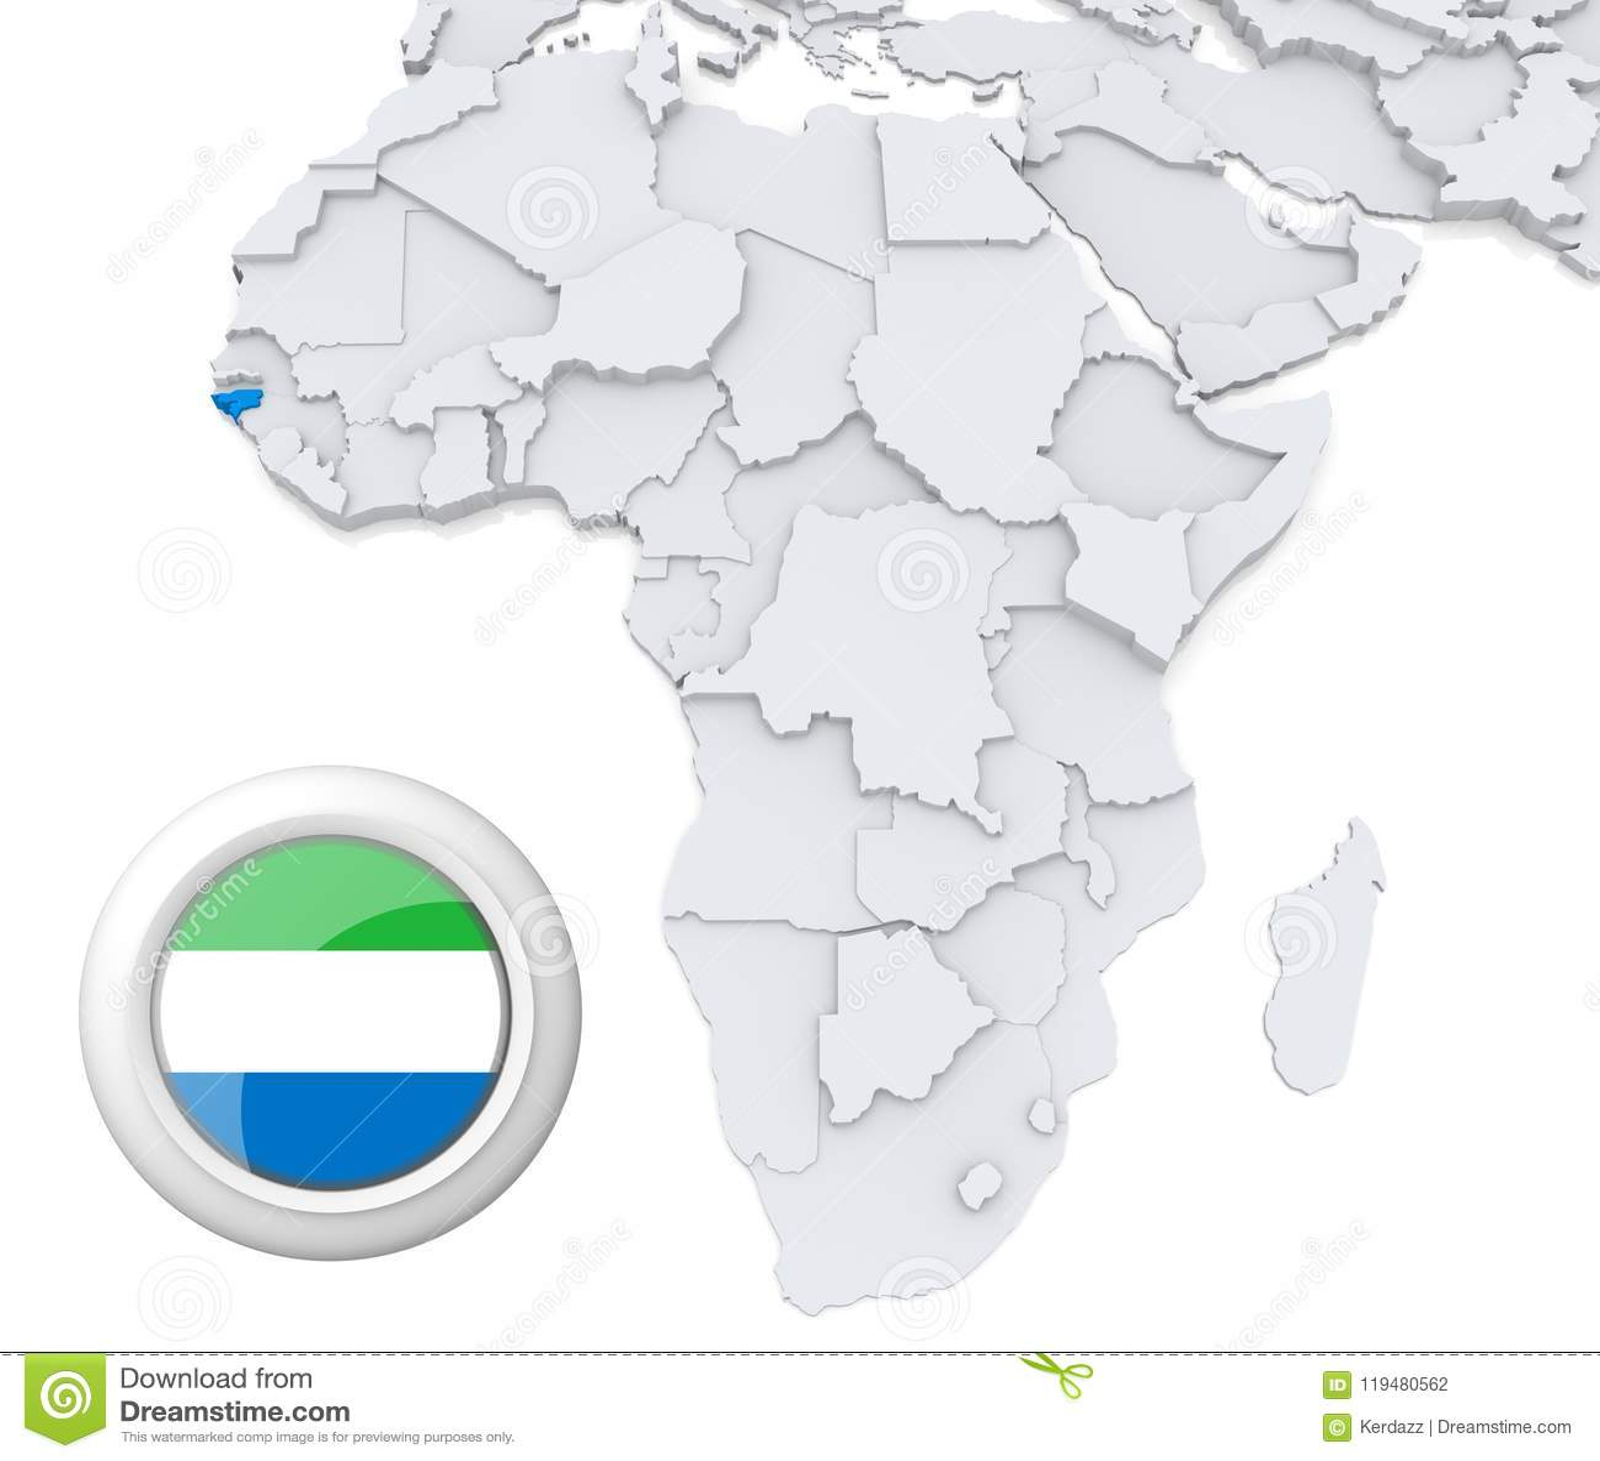 Sierra Leone on Africa map stock illustration. Illustration of